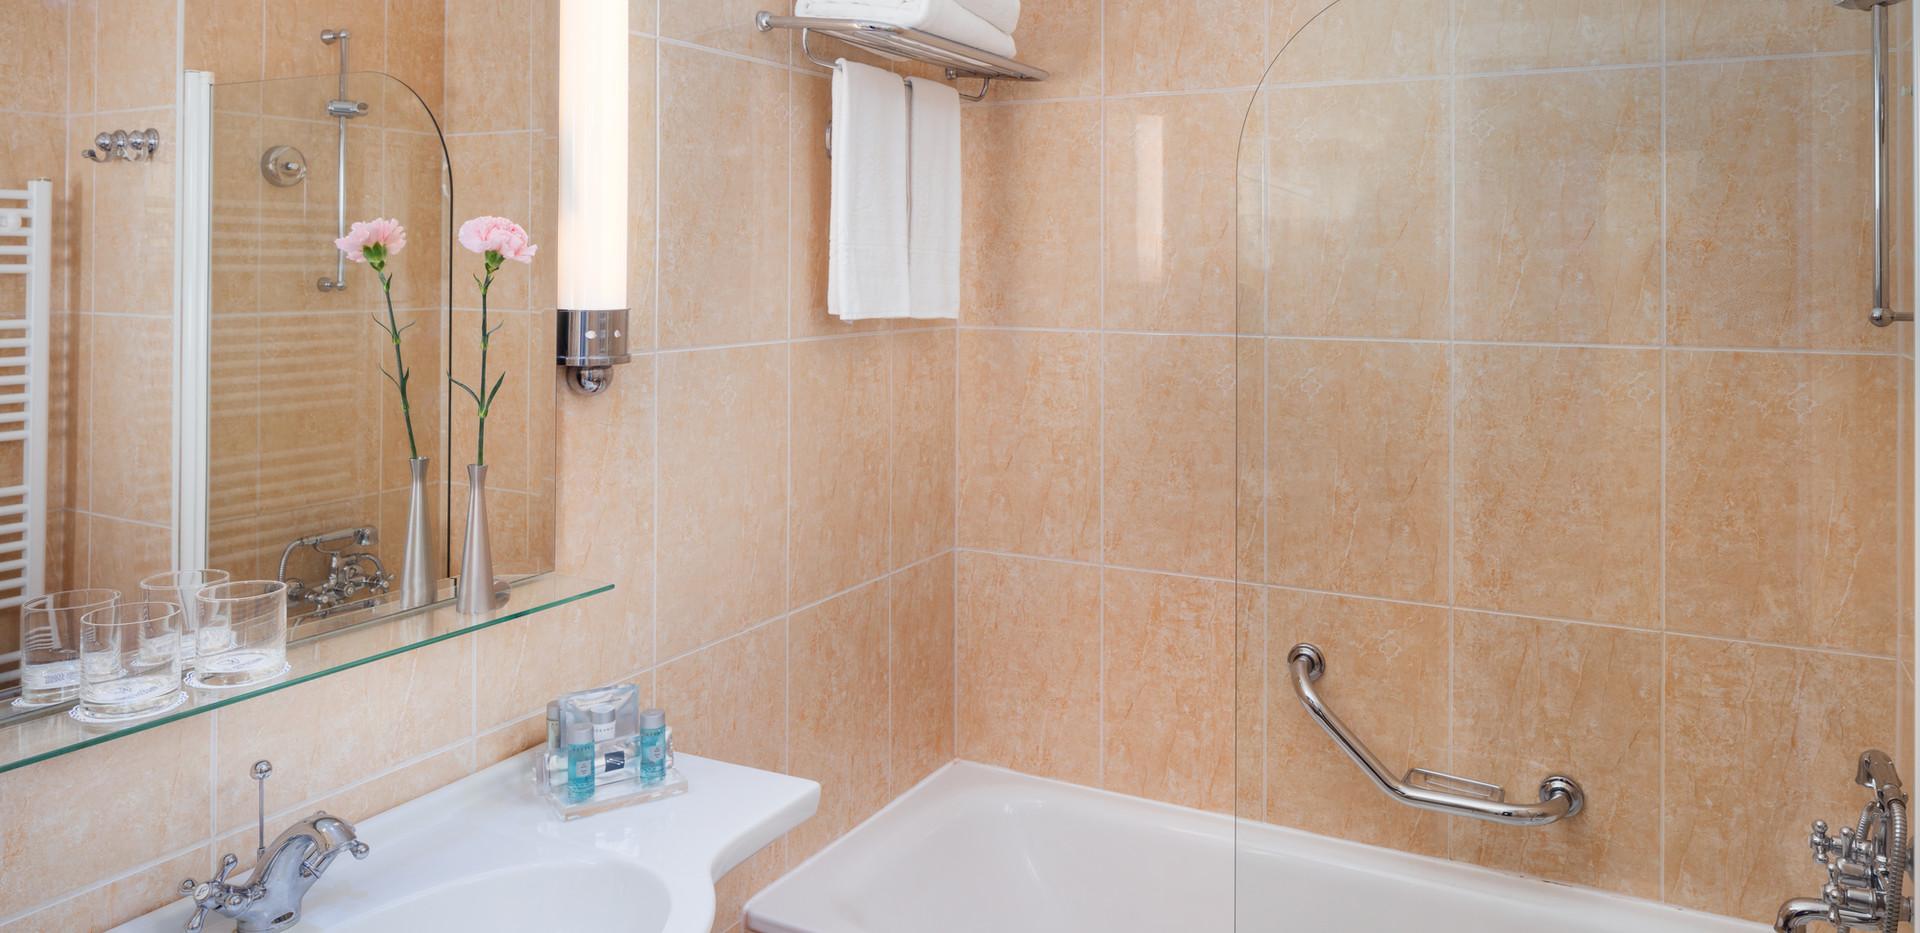 Thermia_Palace_bathroom.jpg